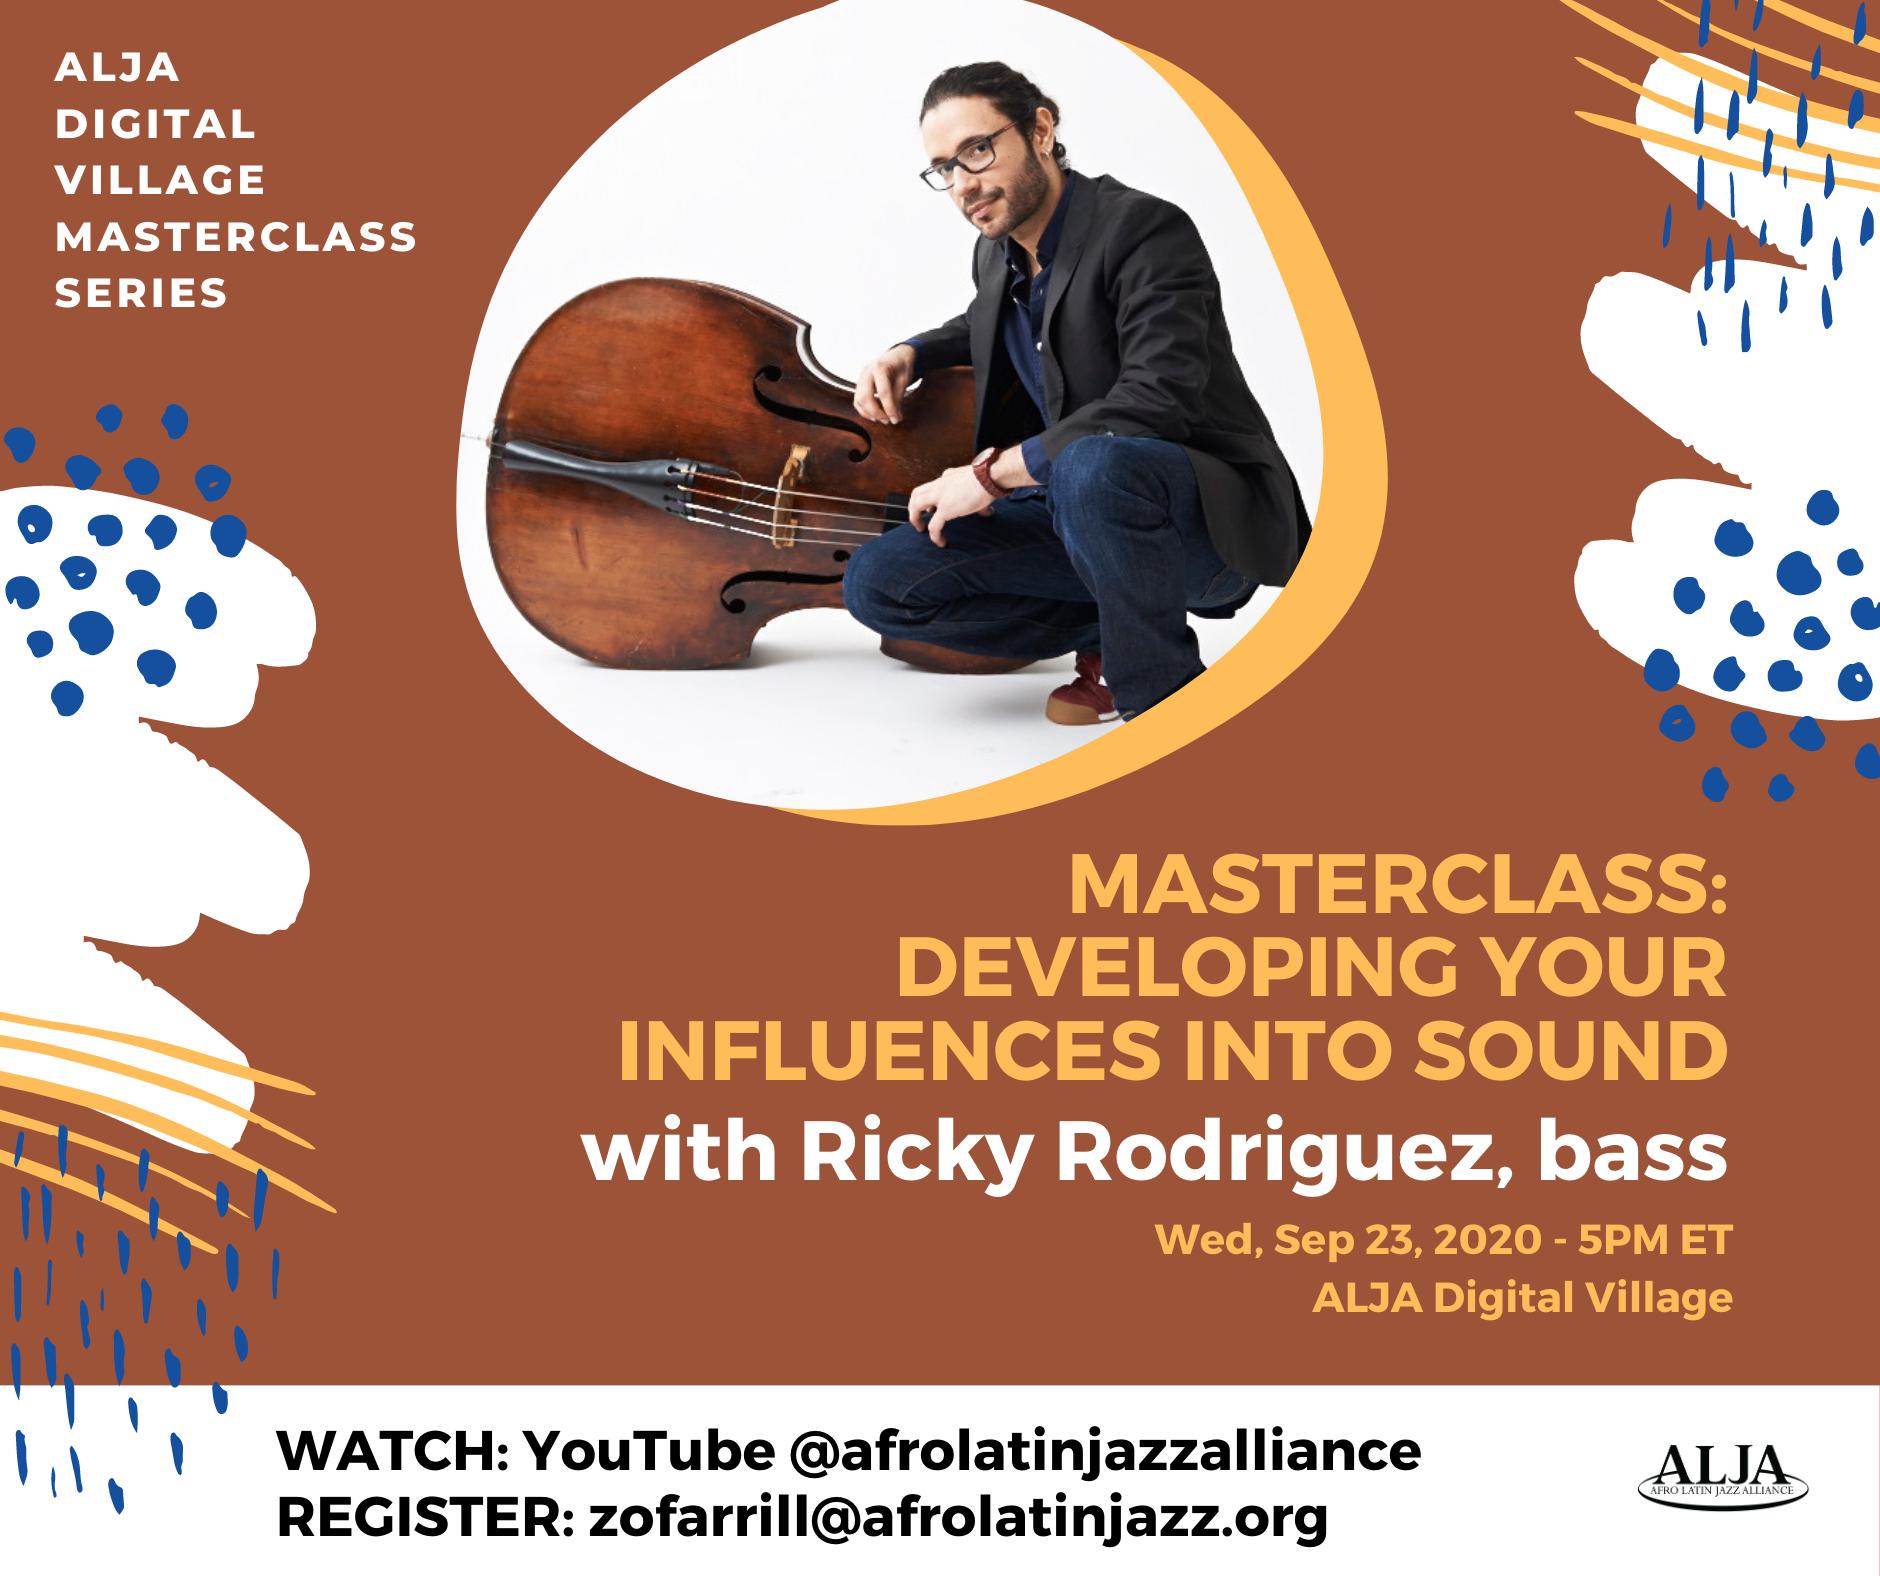 Master Class SeriesTurning Your Influences into SoundsRicky Rodríguez, bass